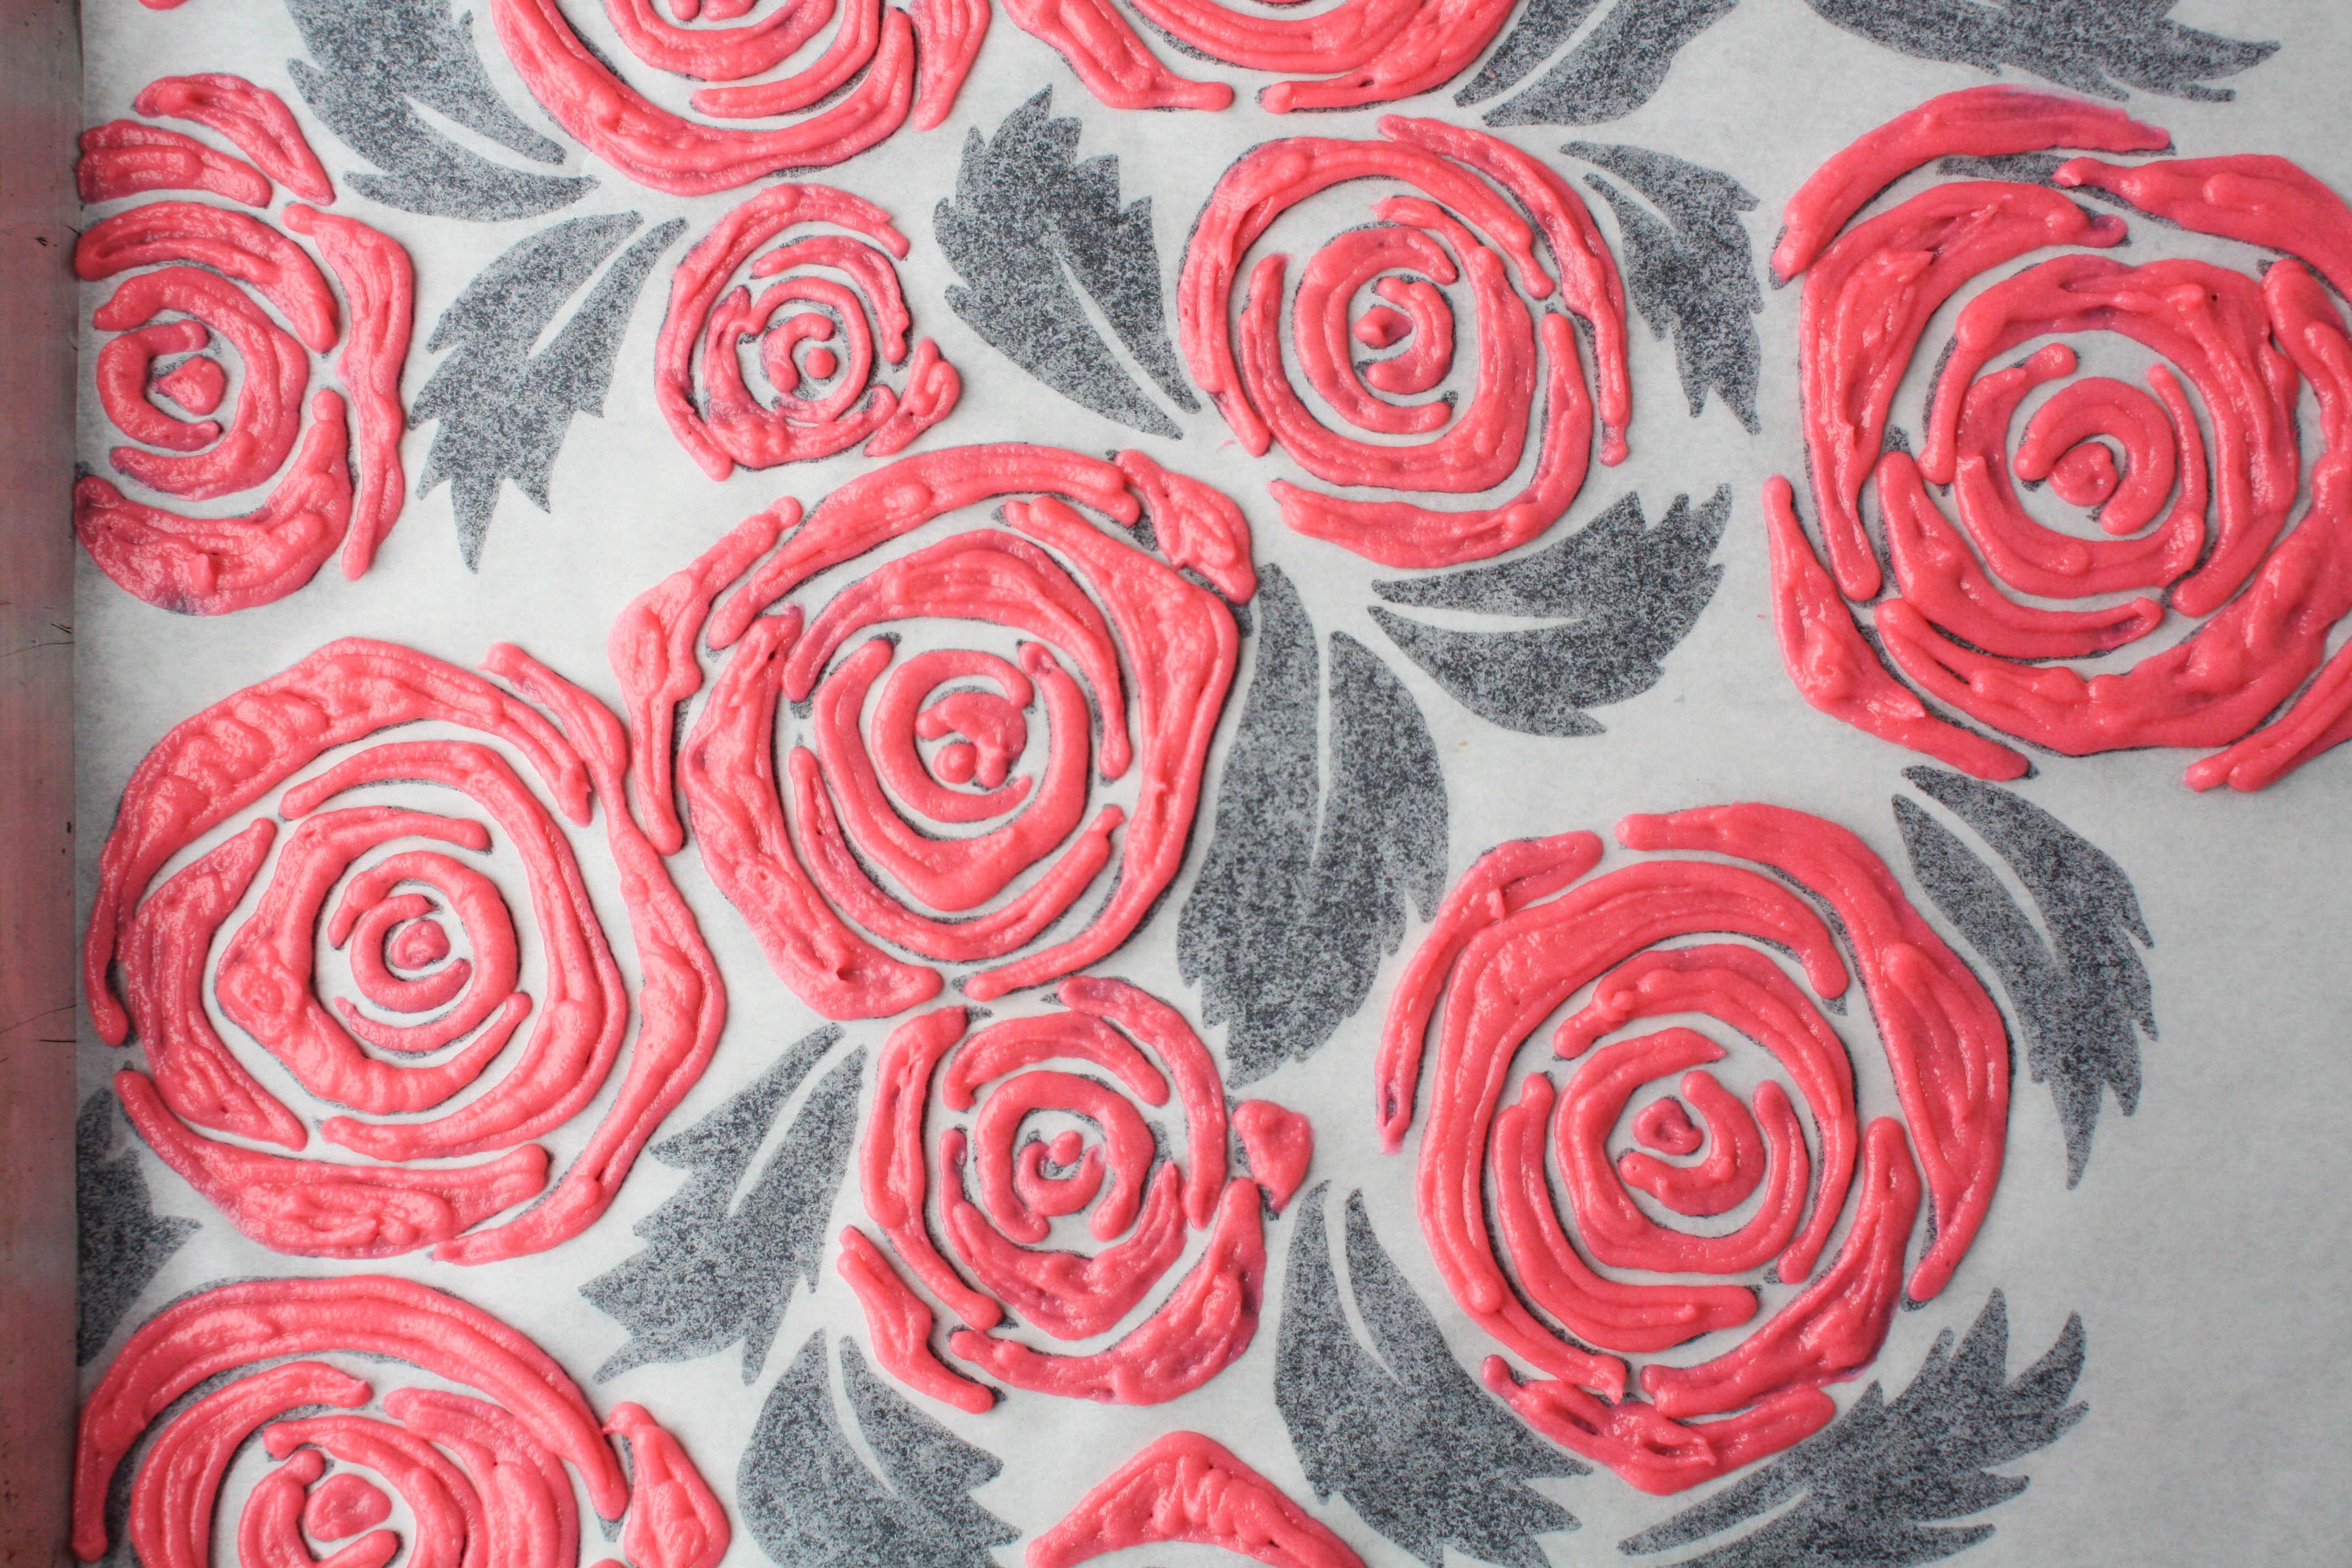 Piped Rose Roll Cake Design | Erin Gardner | Bluprint